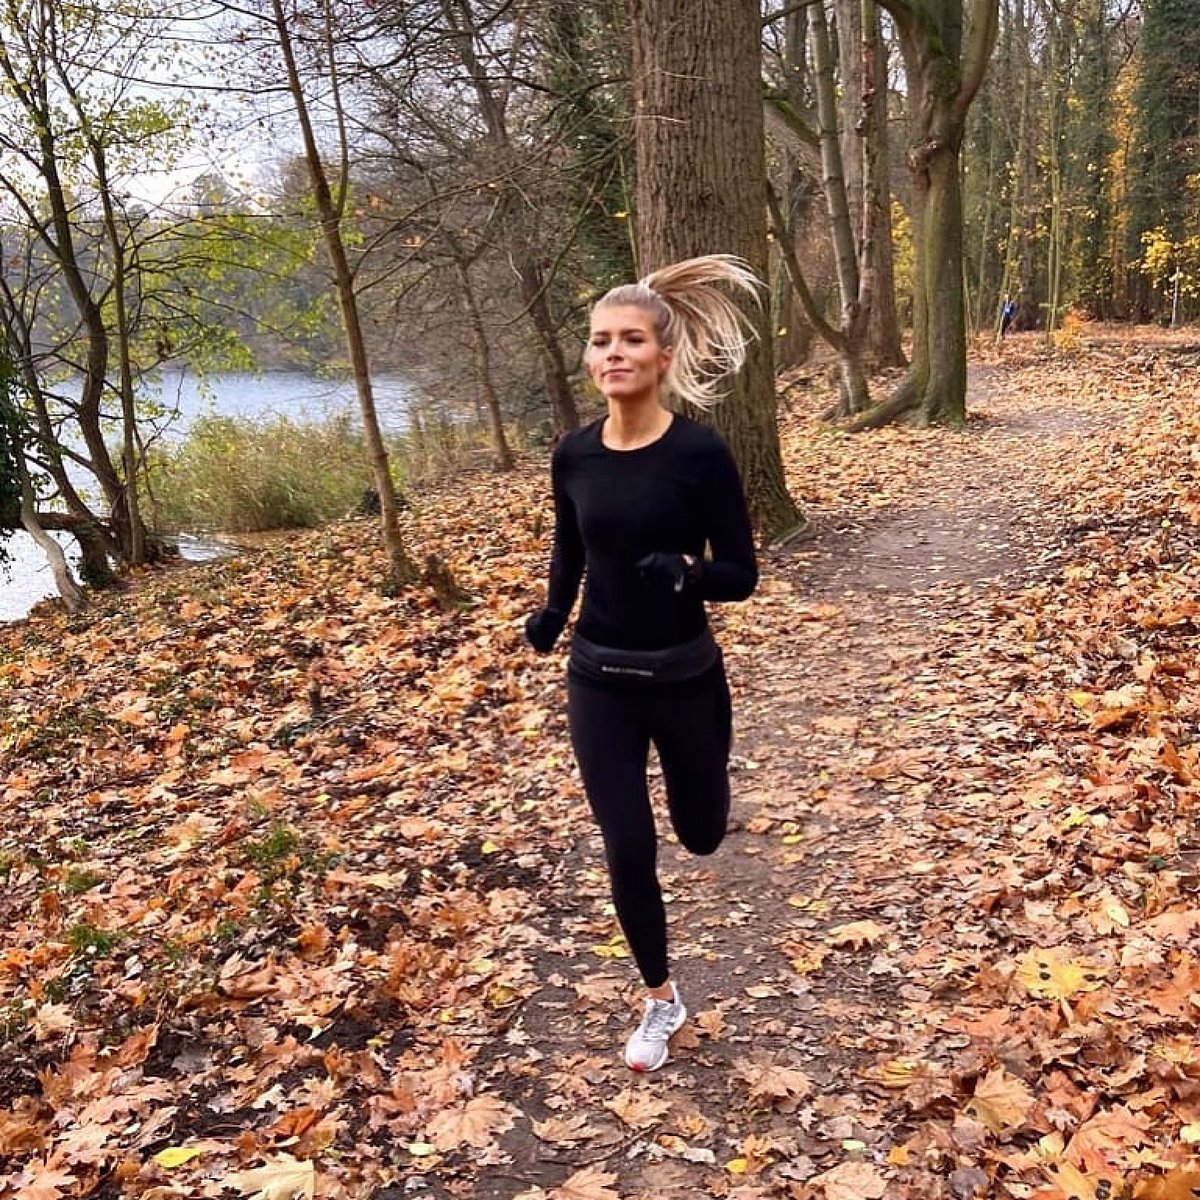 "Thanks for sharing your running motivation. Also great quote    ""I'll be happy if running and I can grow old together.""  -Haruki Murakami-  http://www.buildandfitness.co.uk  #buildandfitness #runningbelt #laufen #liebeslauftagebuch #runhappy #laufenverbindet #run #runninggirlpic.twitter.com/bB6lfAAdIh"